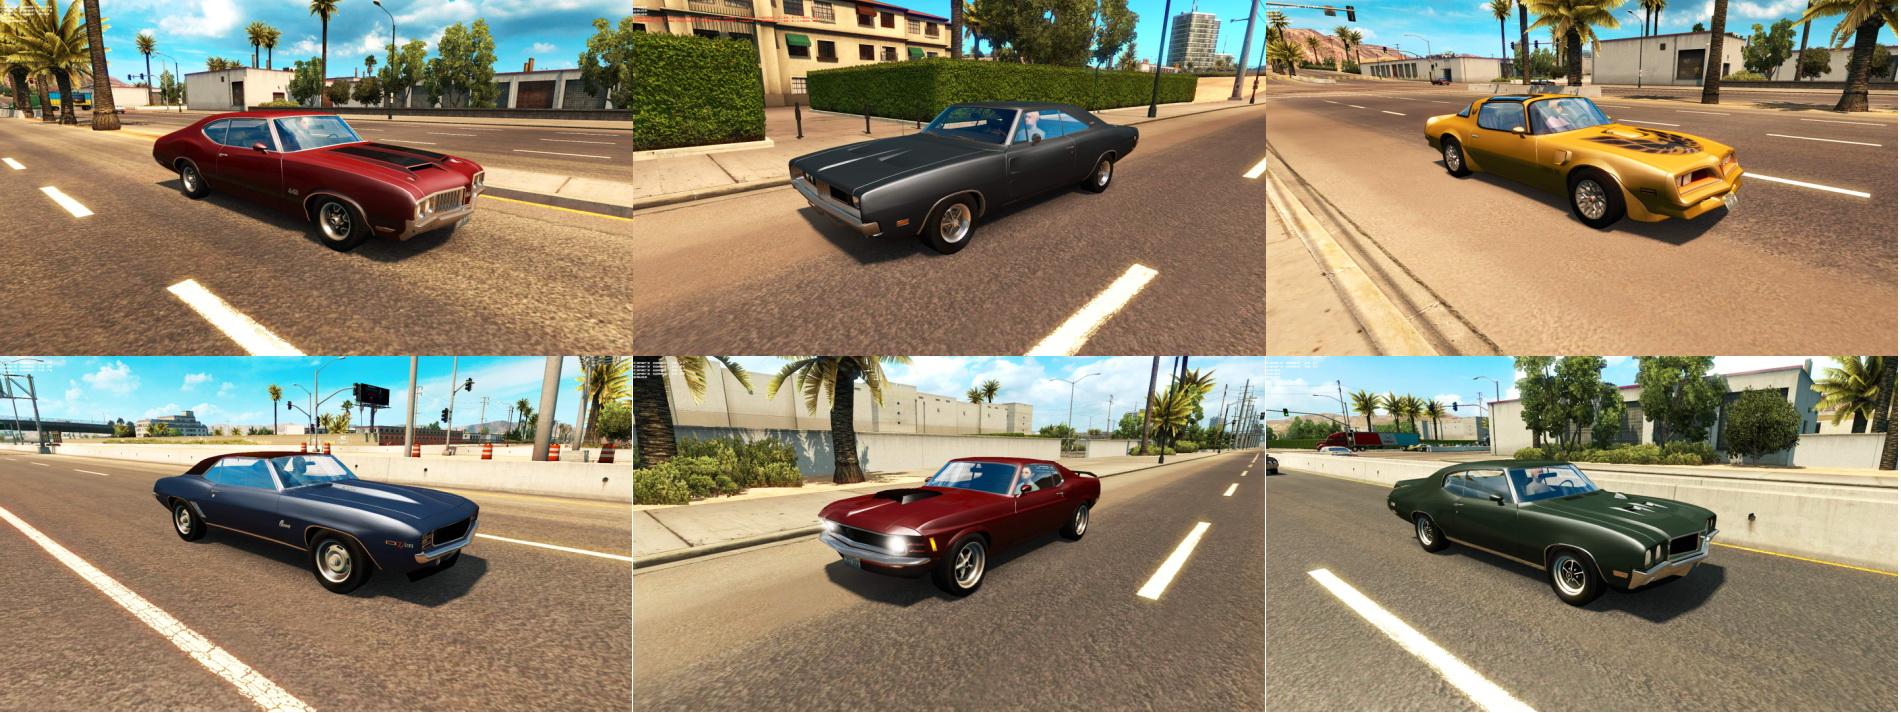 classic_ai_traffic_pack_by_Jazzycat_v1.0.jpg